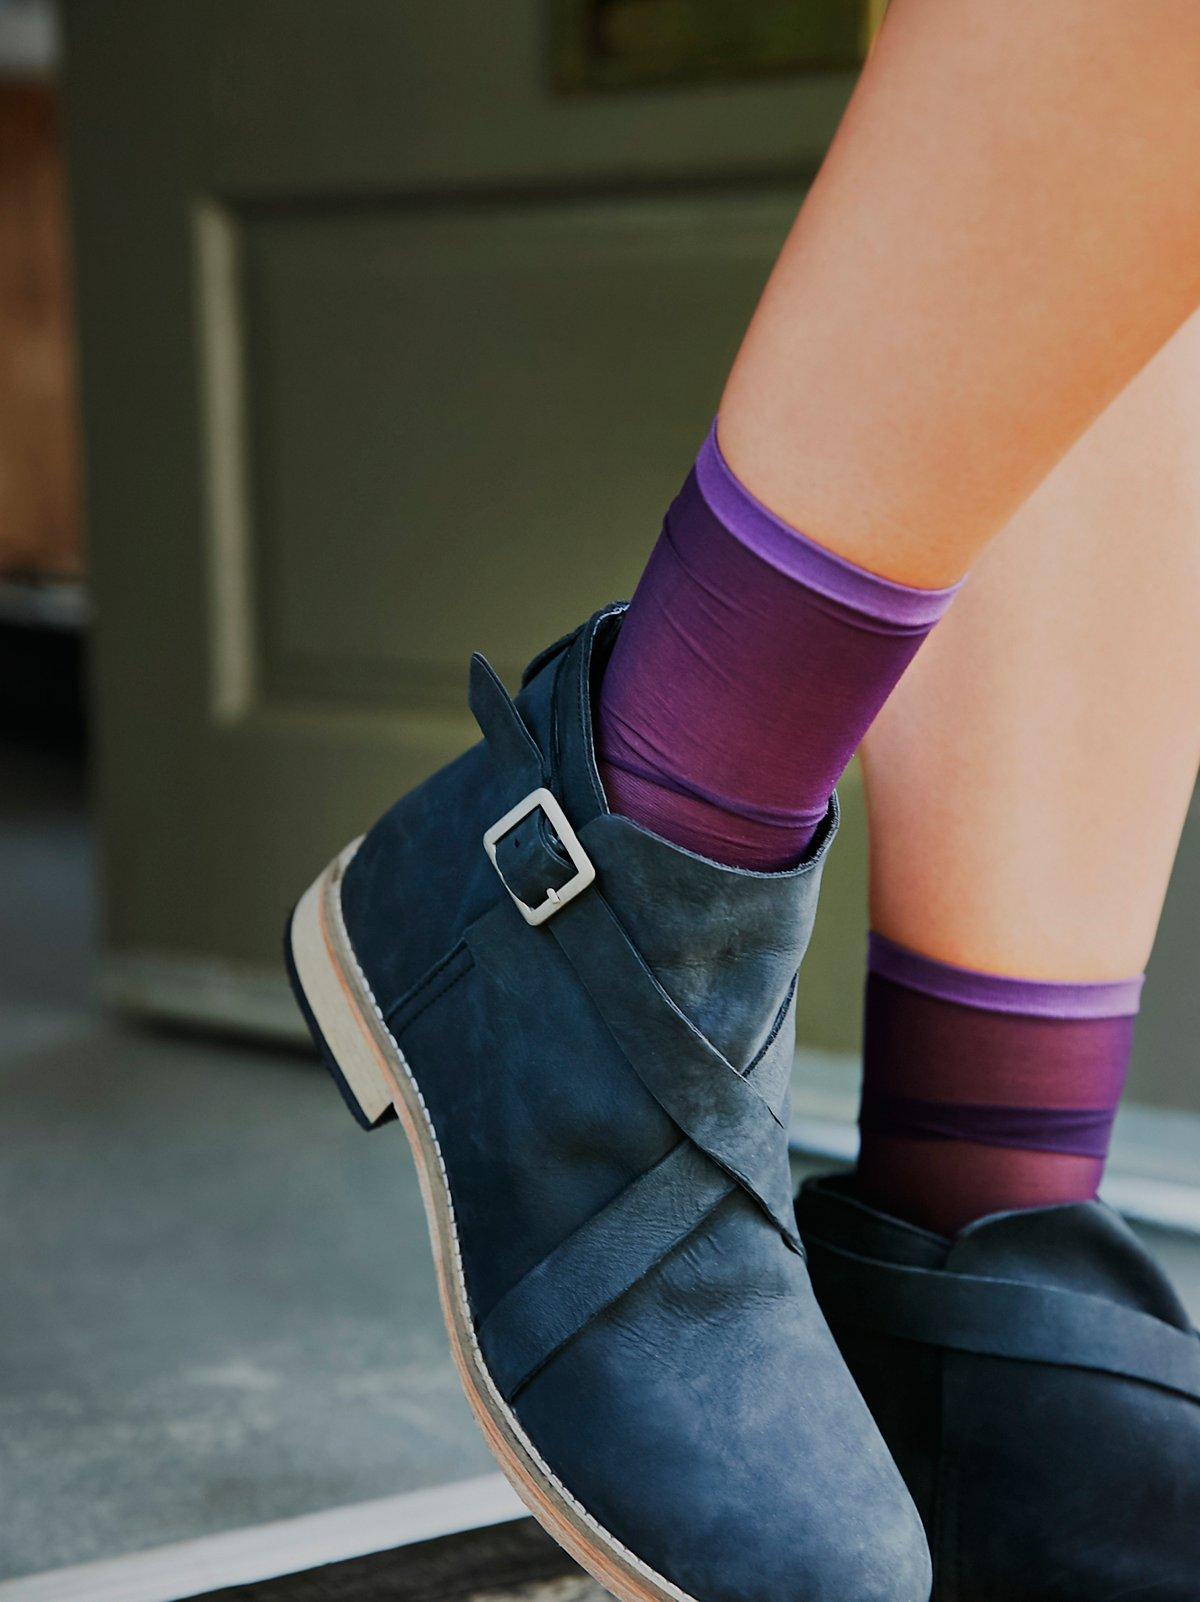 Lovelight短筒袜